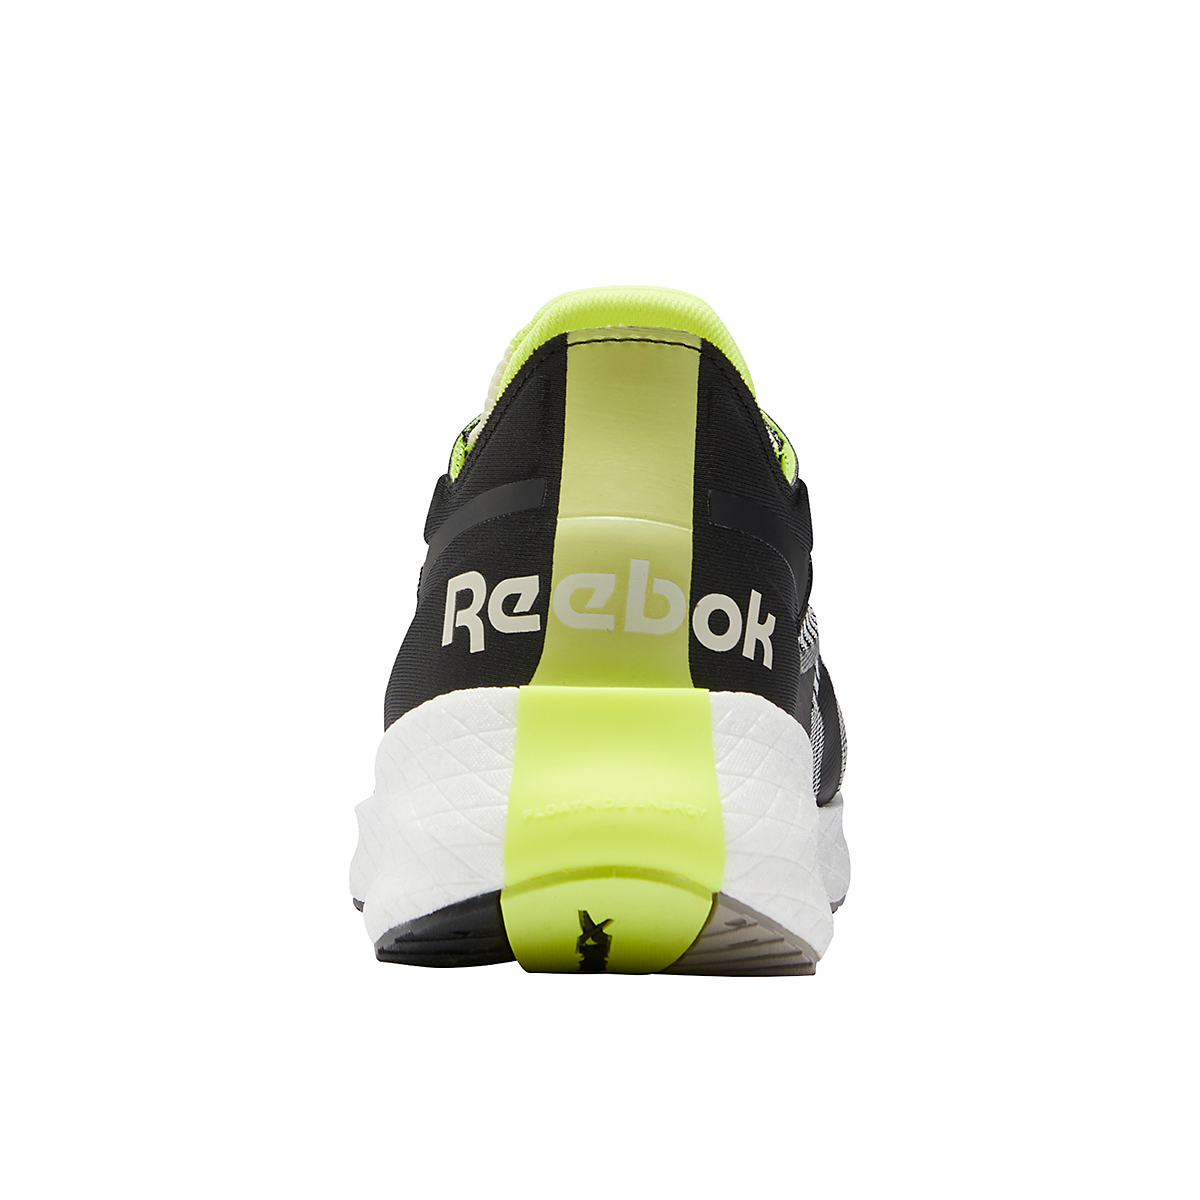 Men's Reebok Floatride Energy Symmetros Running Shoe - Color: Classic White/Core Black/Yellow Flare - Size: 7 - Width: Regular, Classic White/Core Black/Yellow Flare, large, image 6